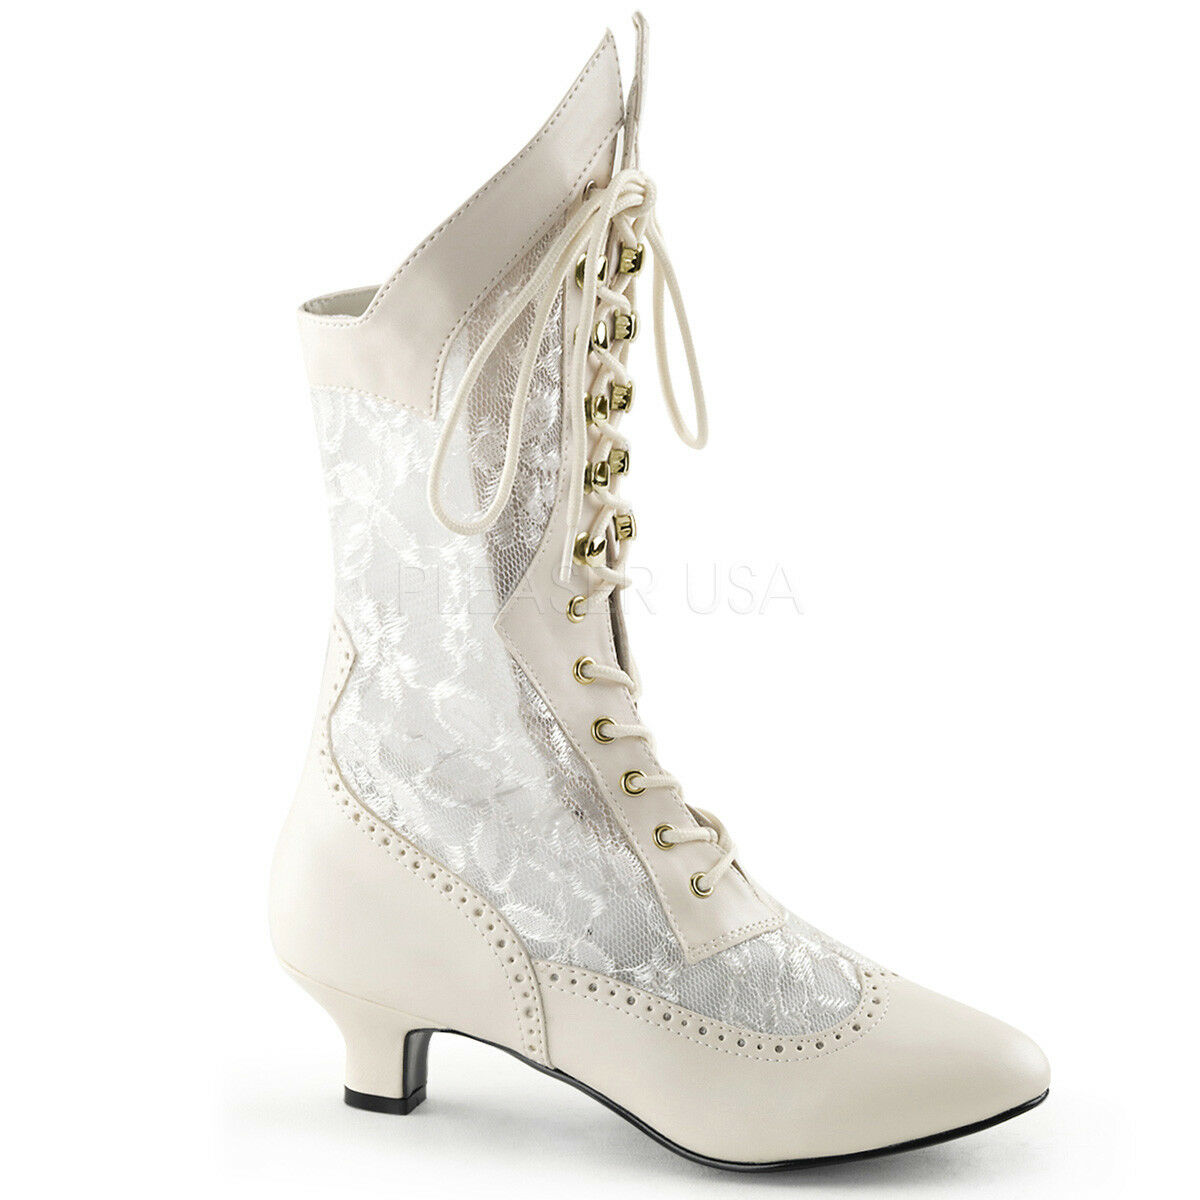 Victorian Steampunk Bridal Burlesque Kitten Heels bianca Ivory Lace Up Boots